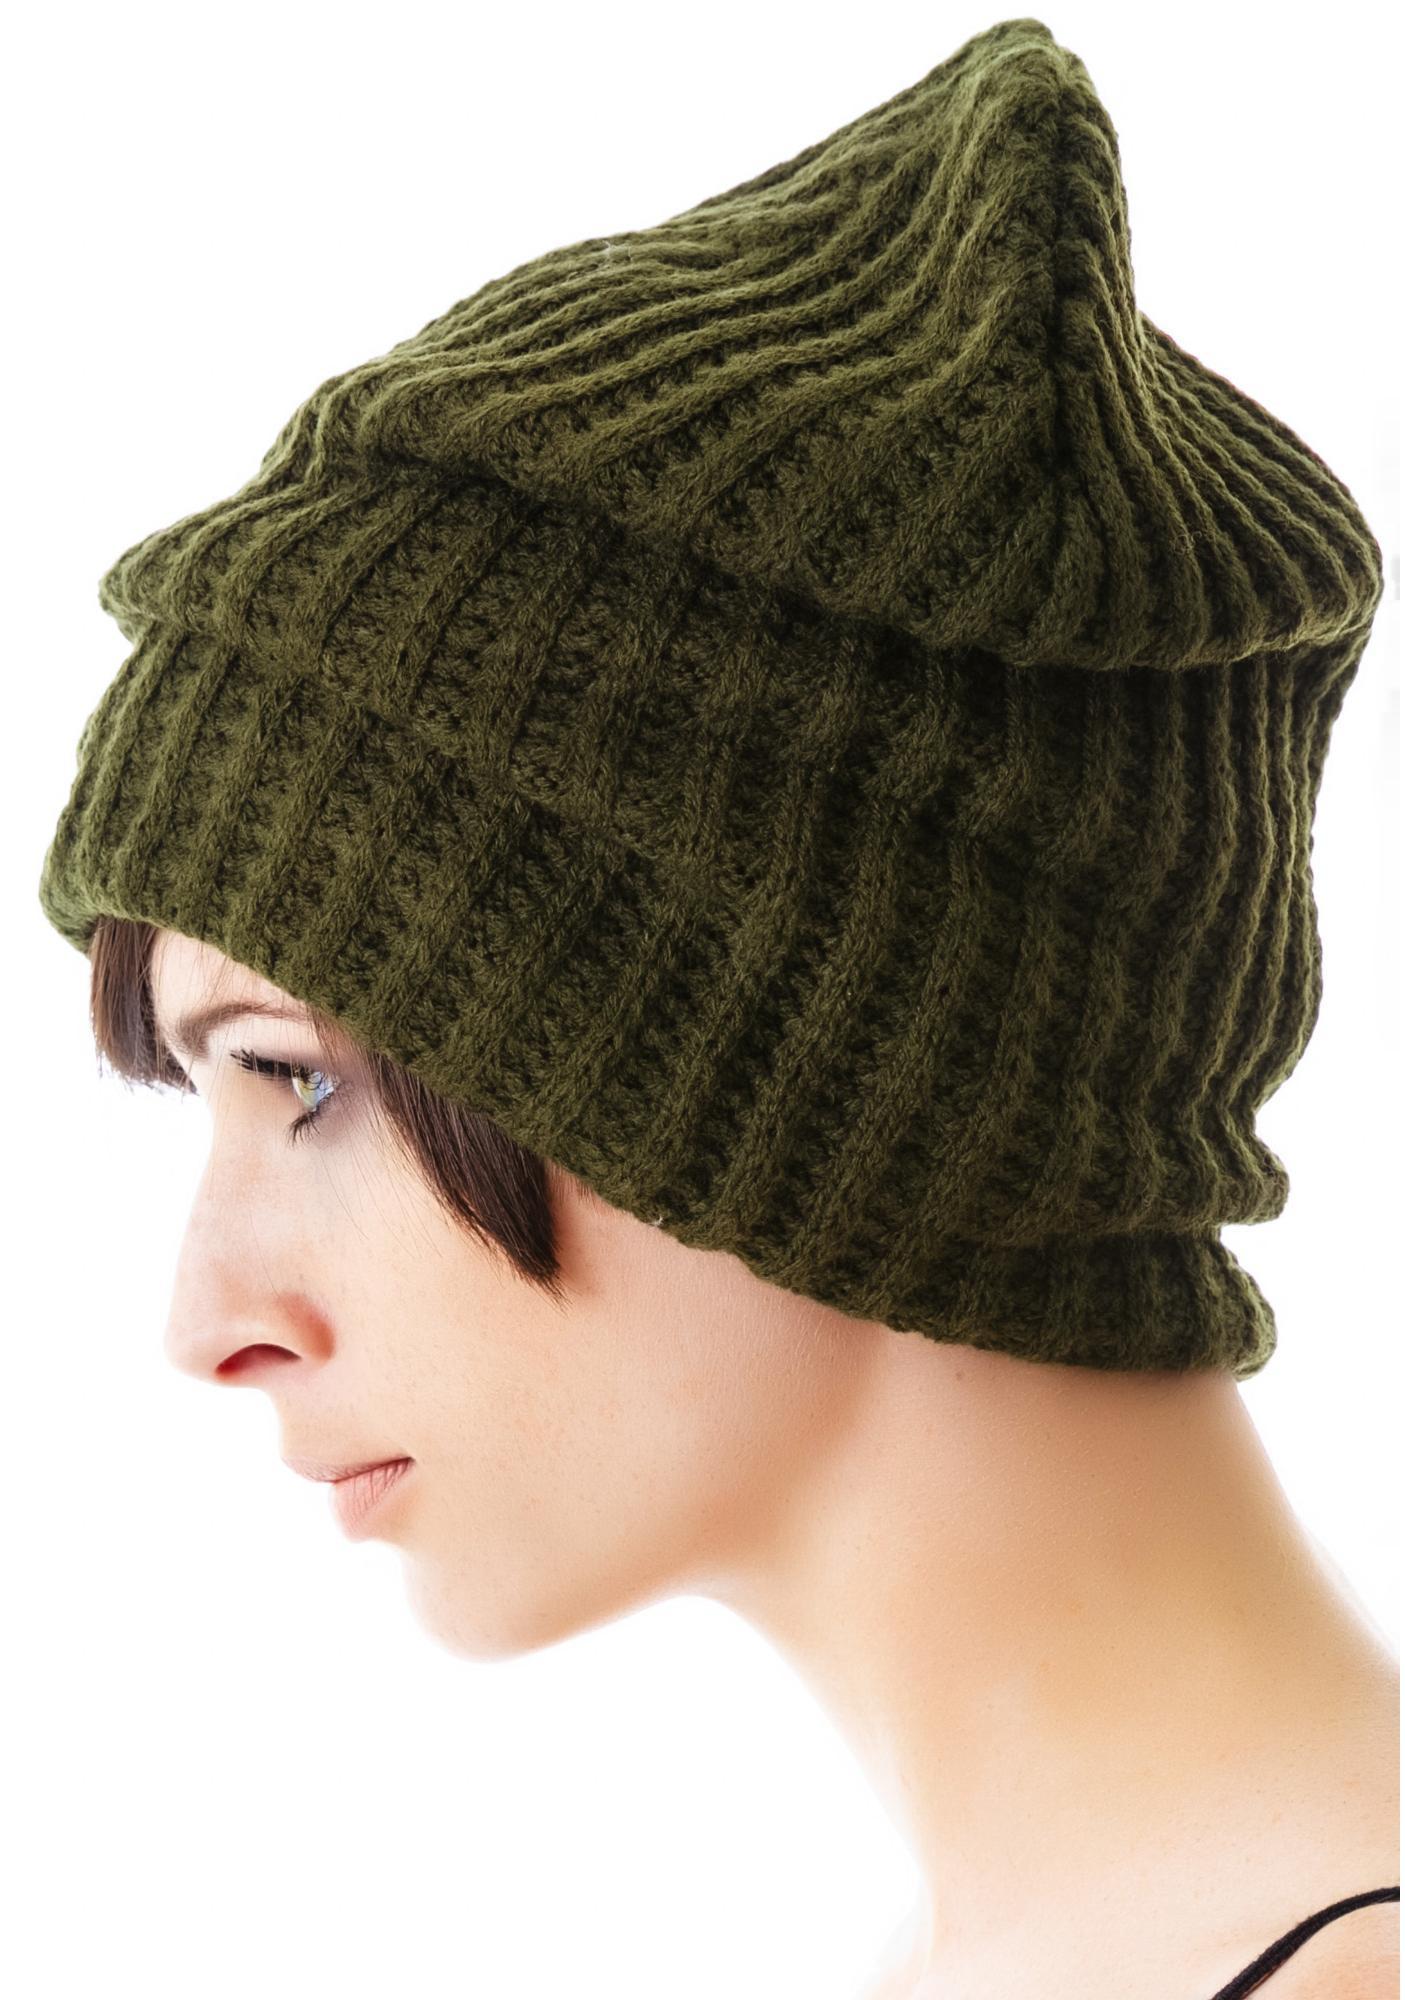 Knitting Pattern Lined Hat : Plush Edie Fleece Lined Thermal Knit Hat Dolls Kill